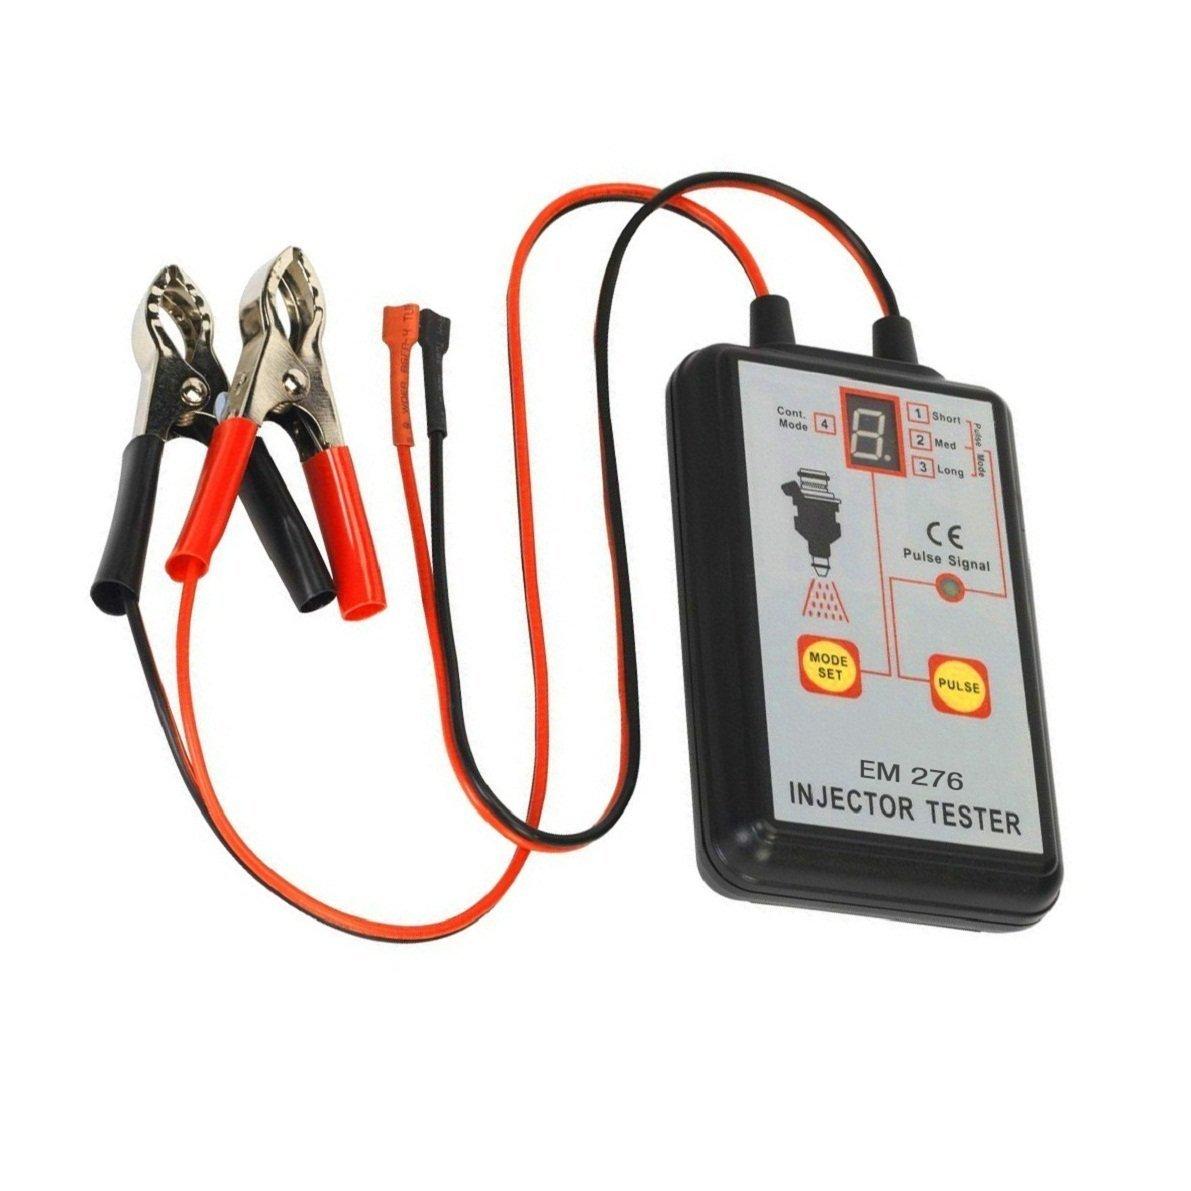 Handheld Car Vehicle Fuel Pressure System Diagnostic Scan Testing Tool Gauge Individual Test Stuck//Leaking//Burnt-out Problem Automotive Fuel Injector Tester 12V 4 Pulse Modes